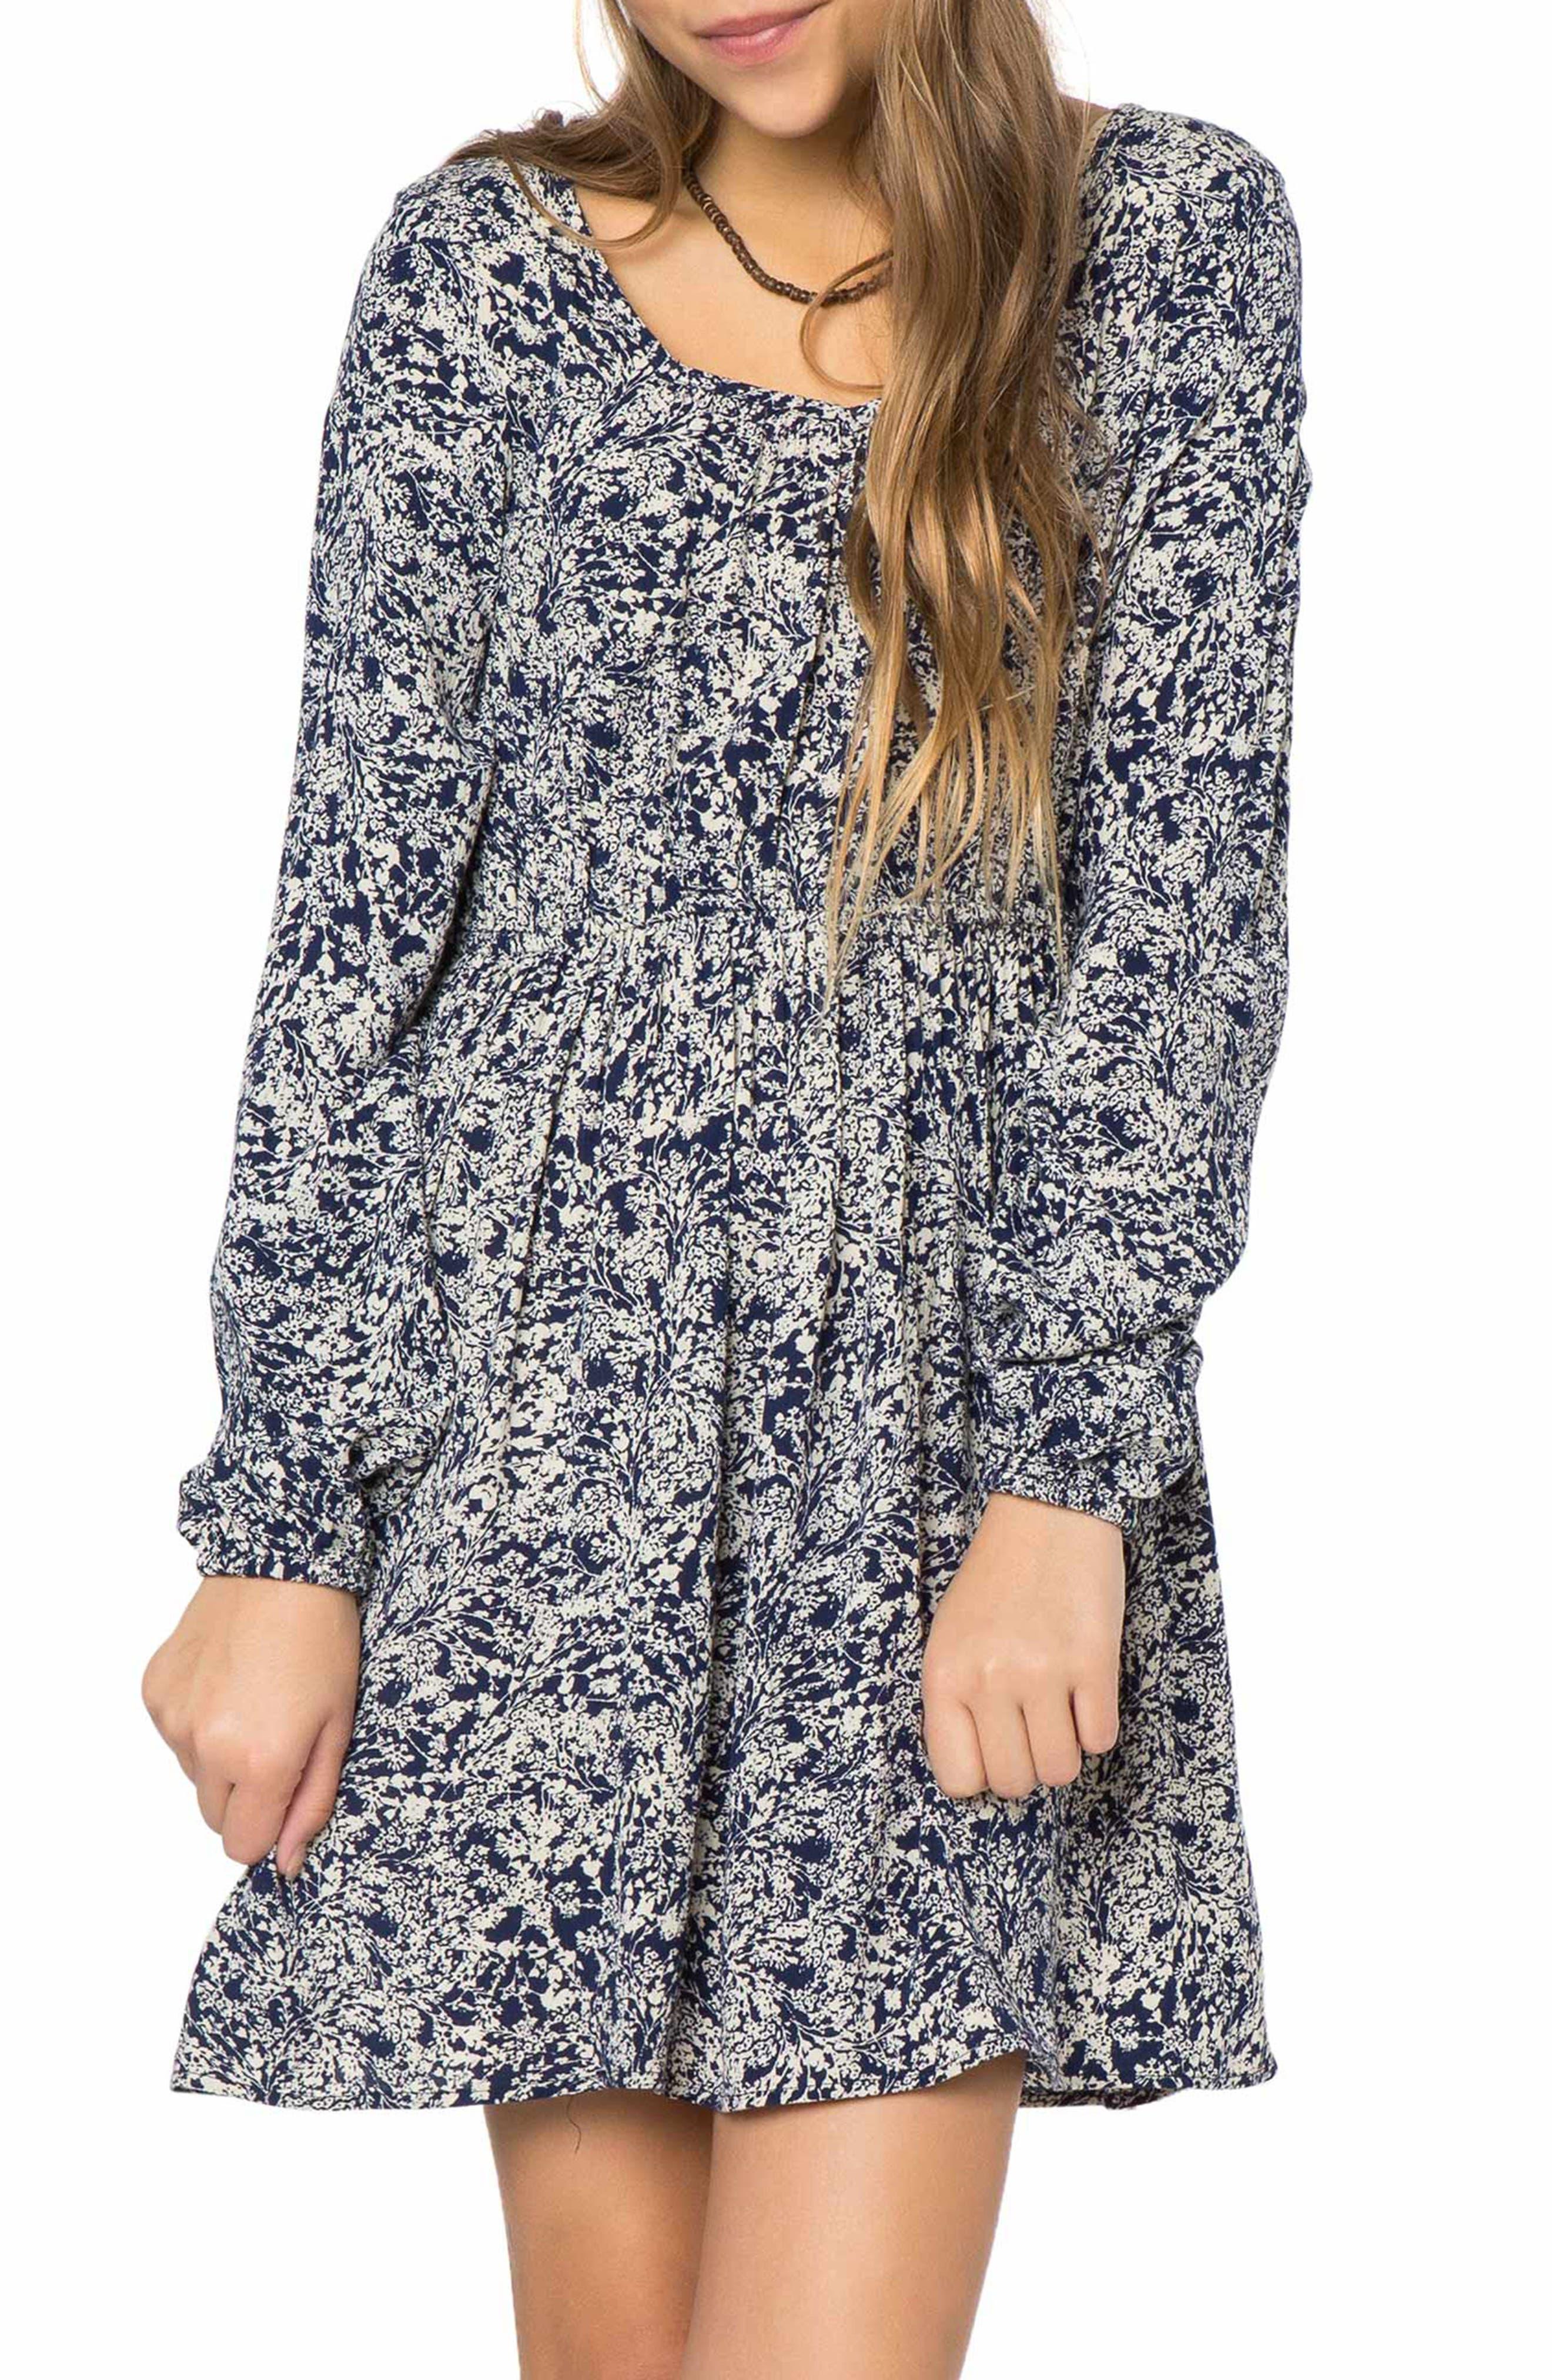 Alternate Image 1 Selected - O'Neill Rhianna Print Dress (Big Girls)